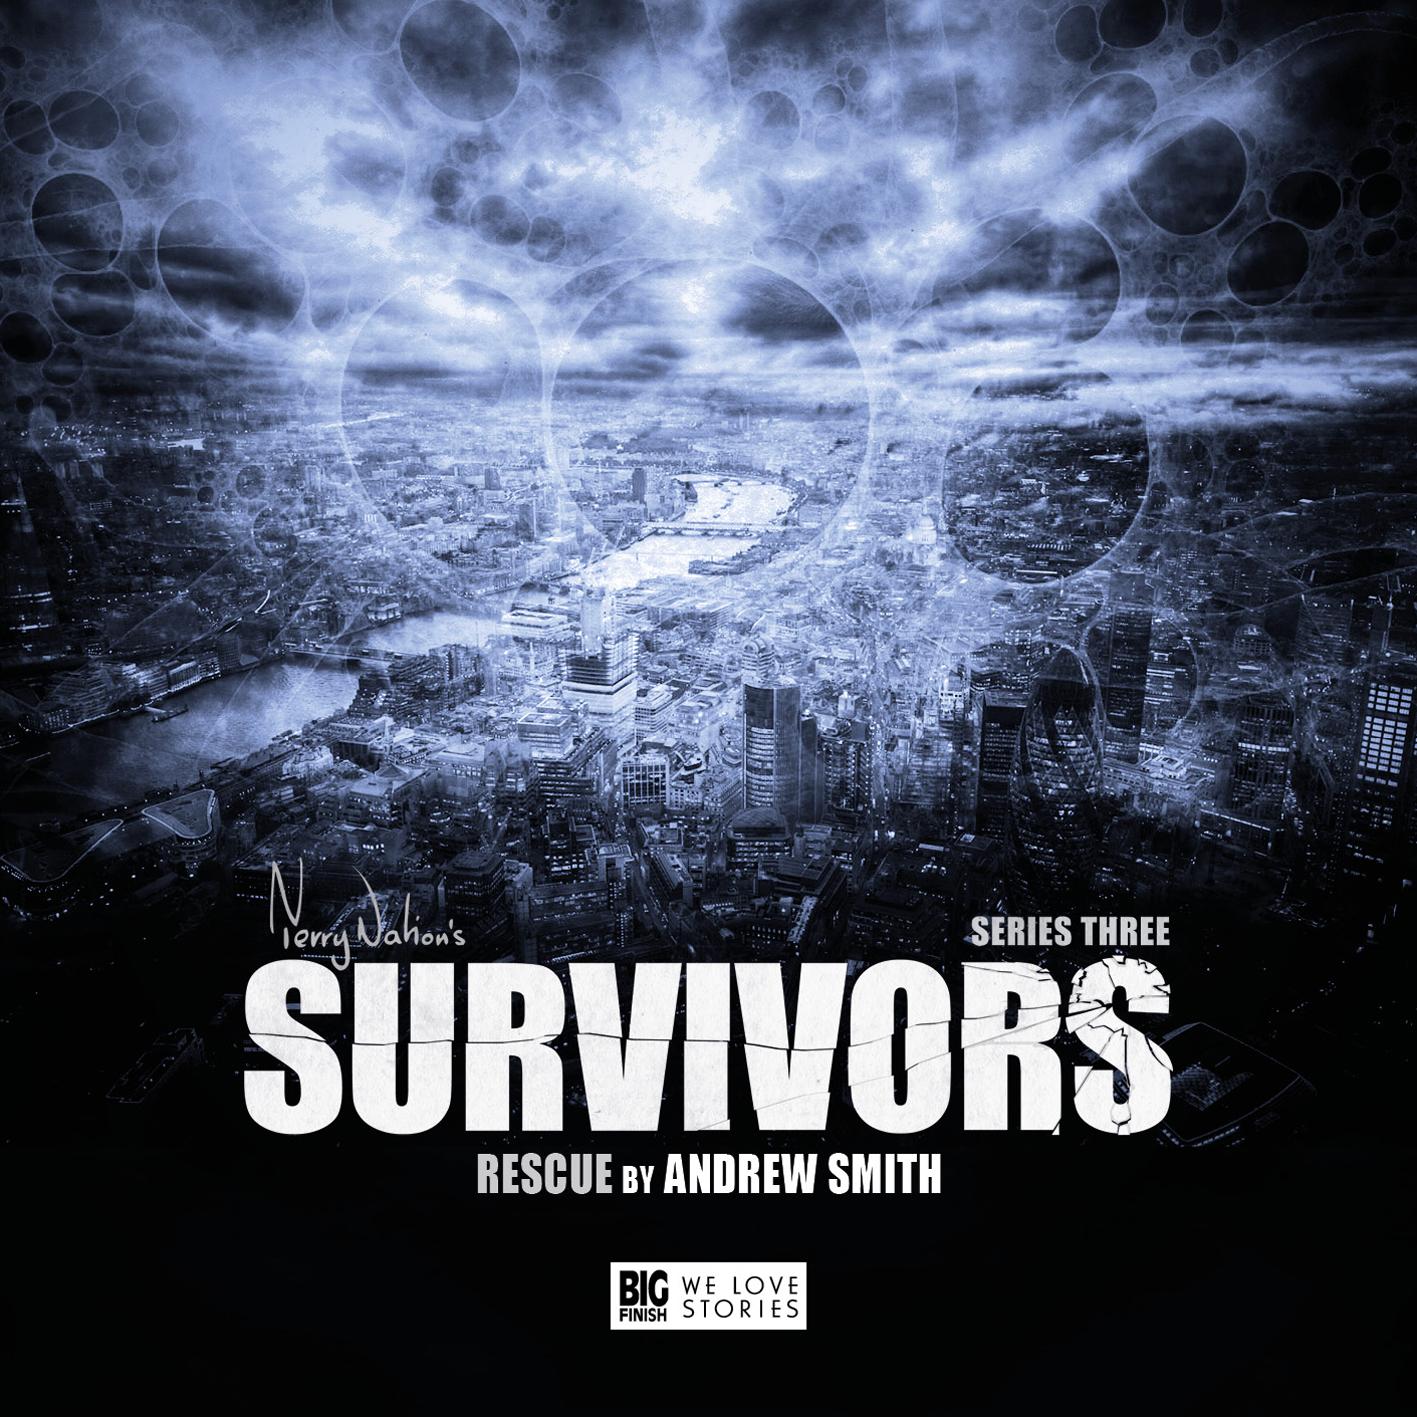 Episode image for Survivors 3:3 Rescue